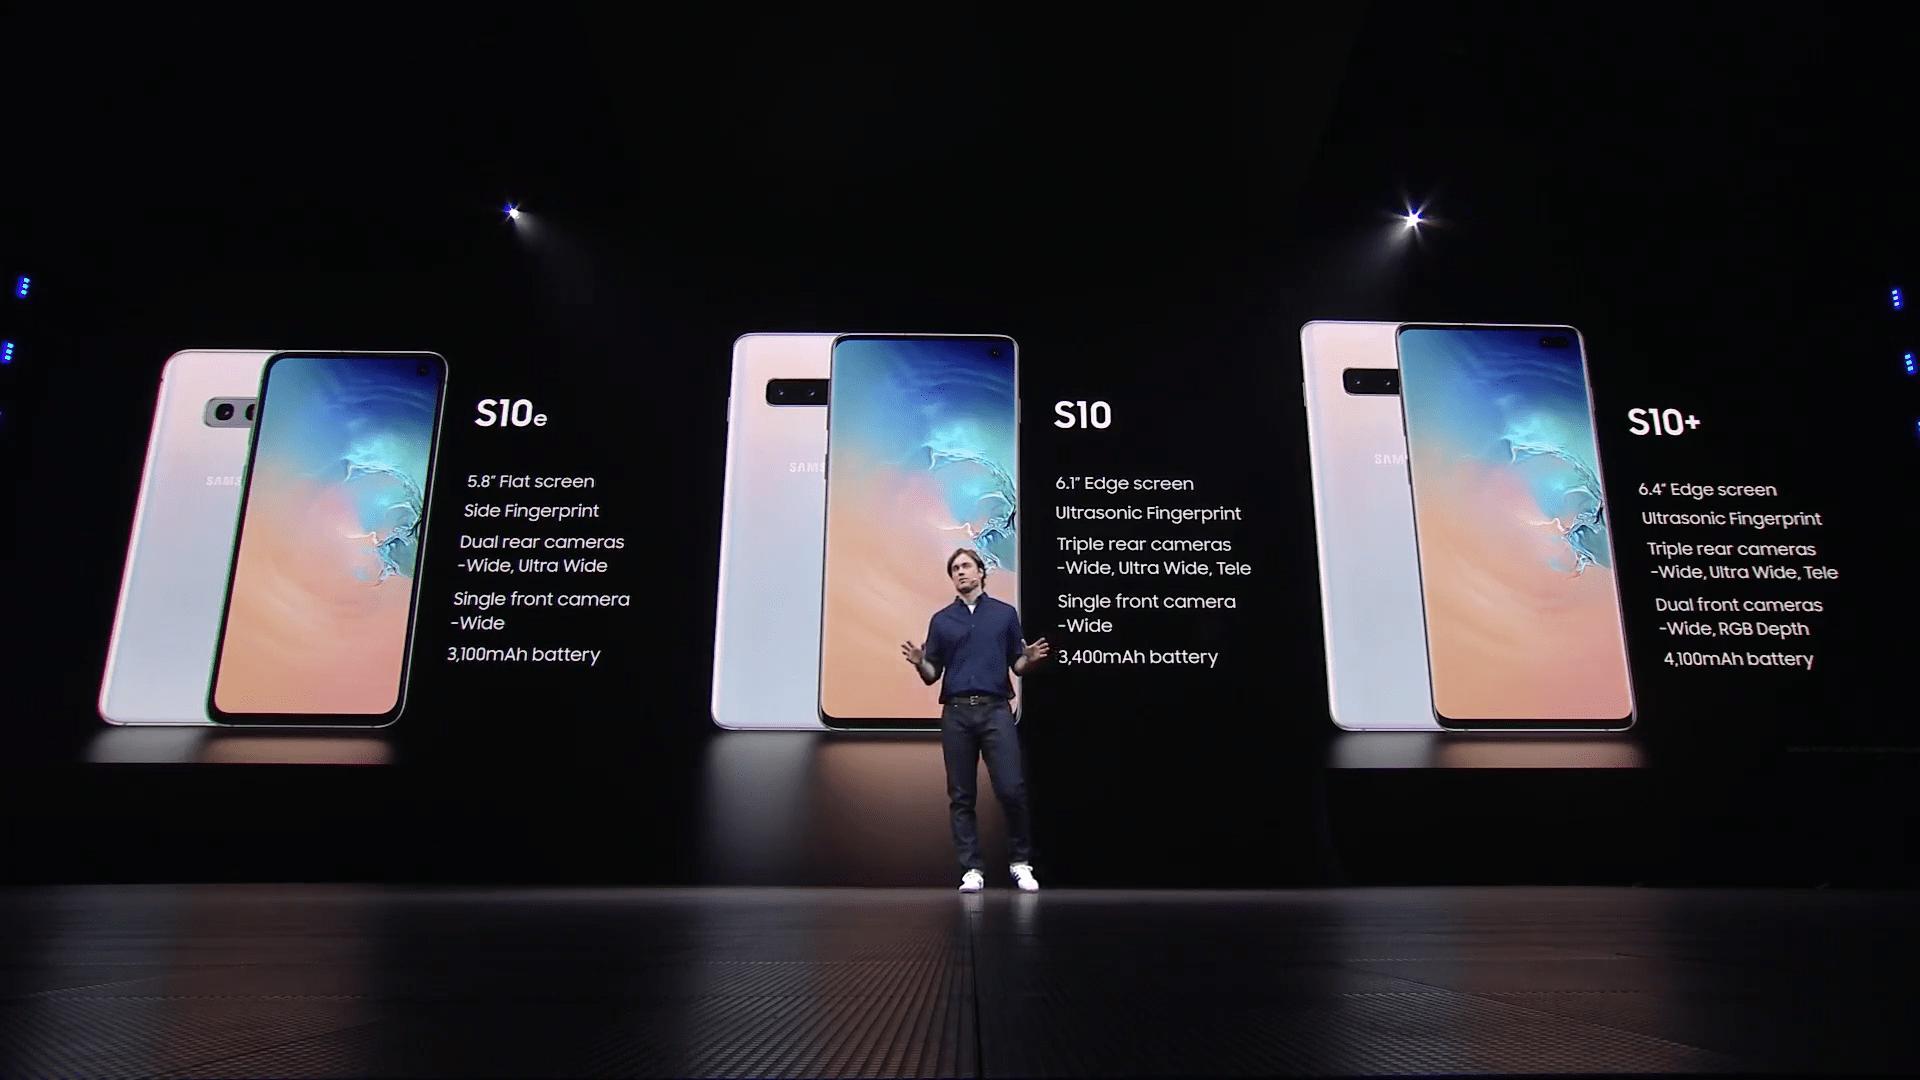 Galaxy Unpacked 2019 live stream 1-27-30 screenshot